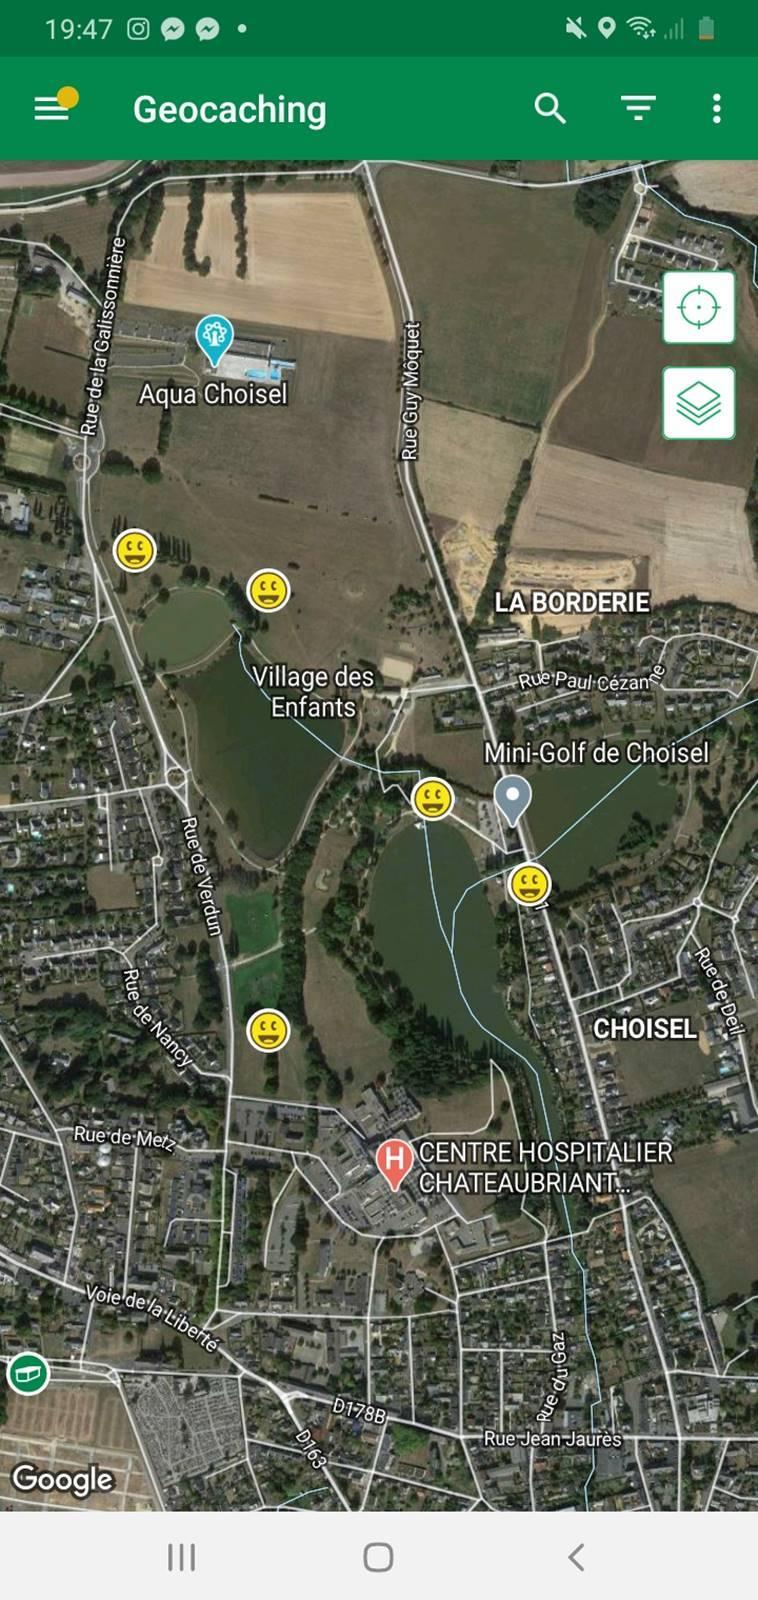 Geocaching chateaubriant choiselscreenshot 20201217 194723 geocaching